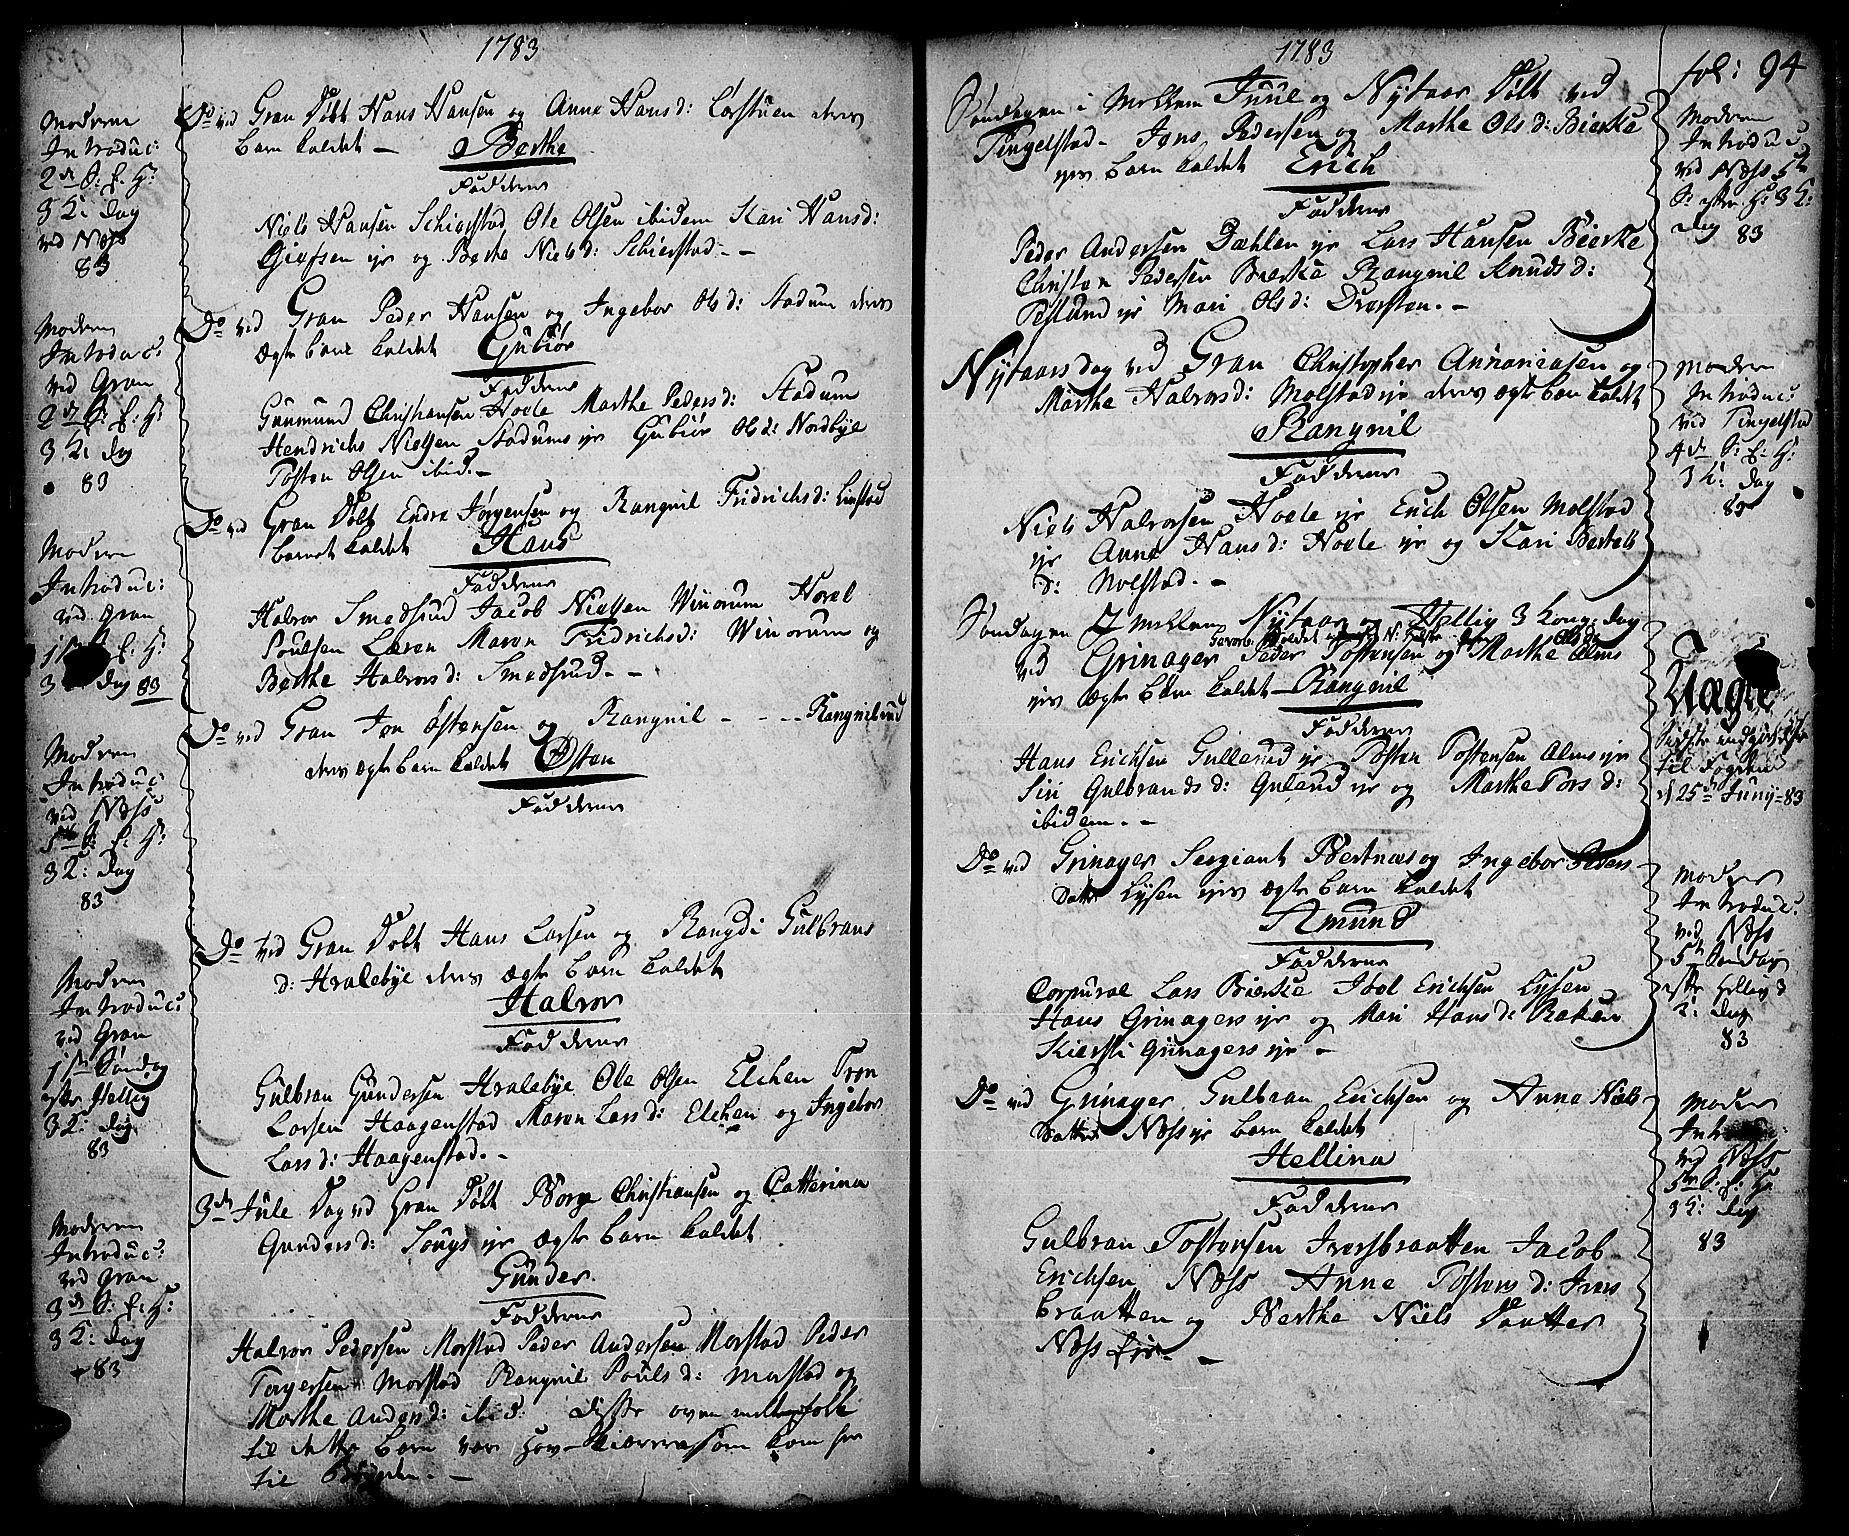 SAH, Gran prestekontor, Ministerialbok nr. 5, 1776-1788, s. 94